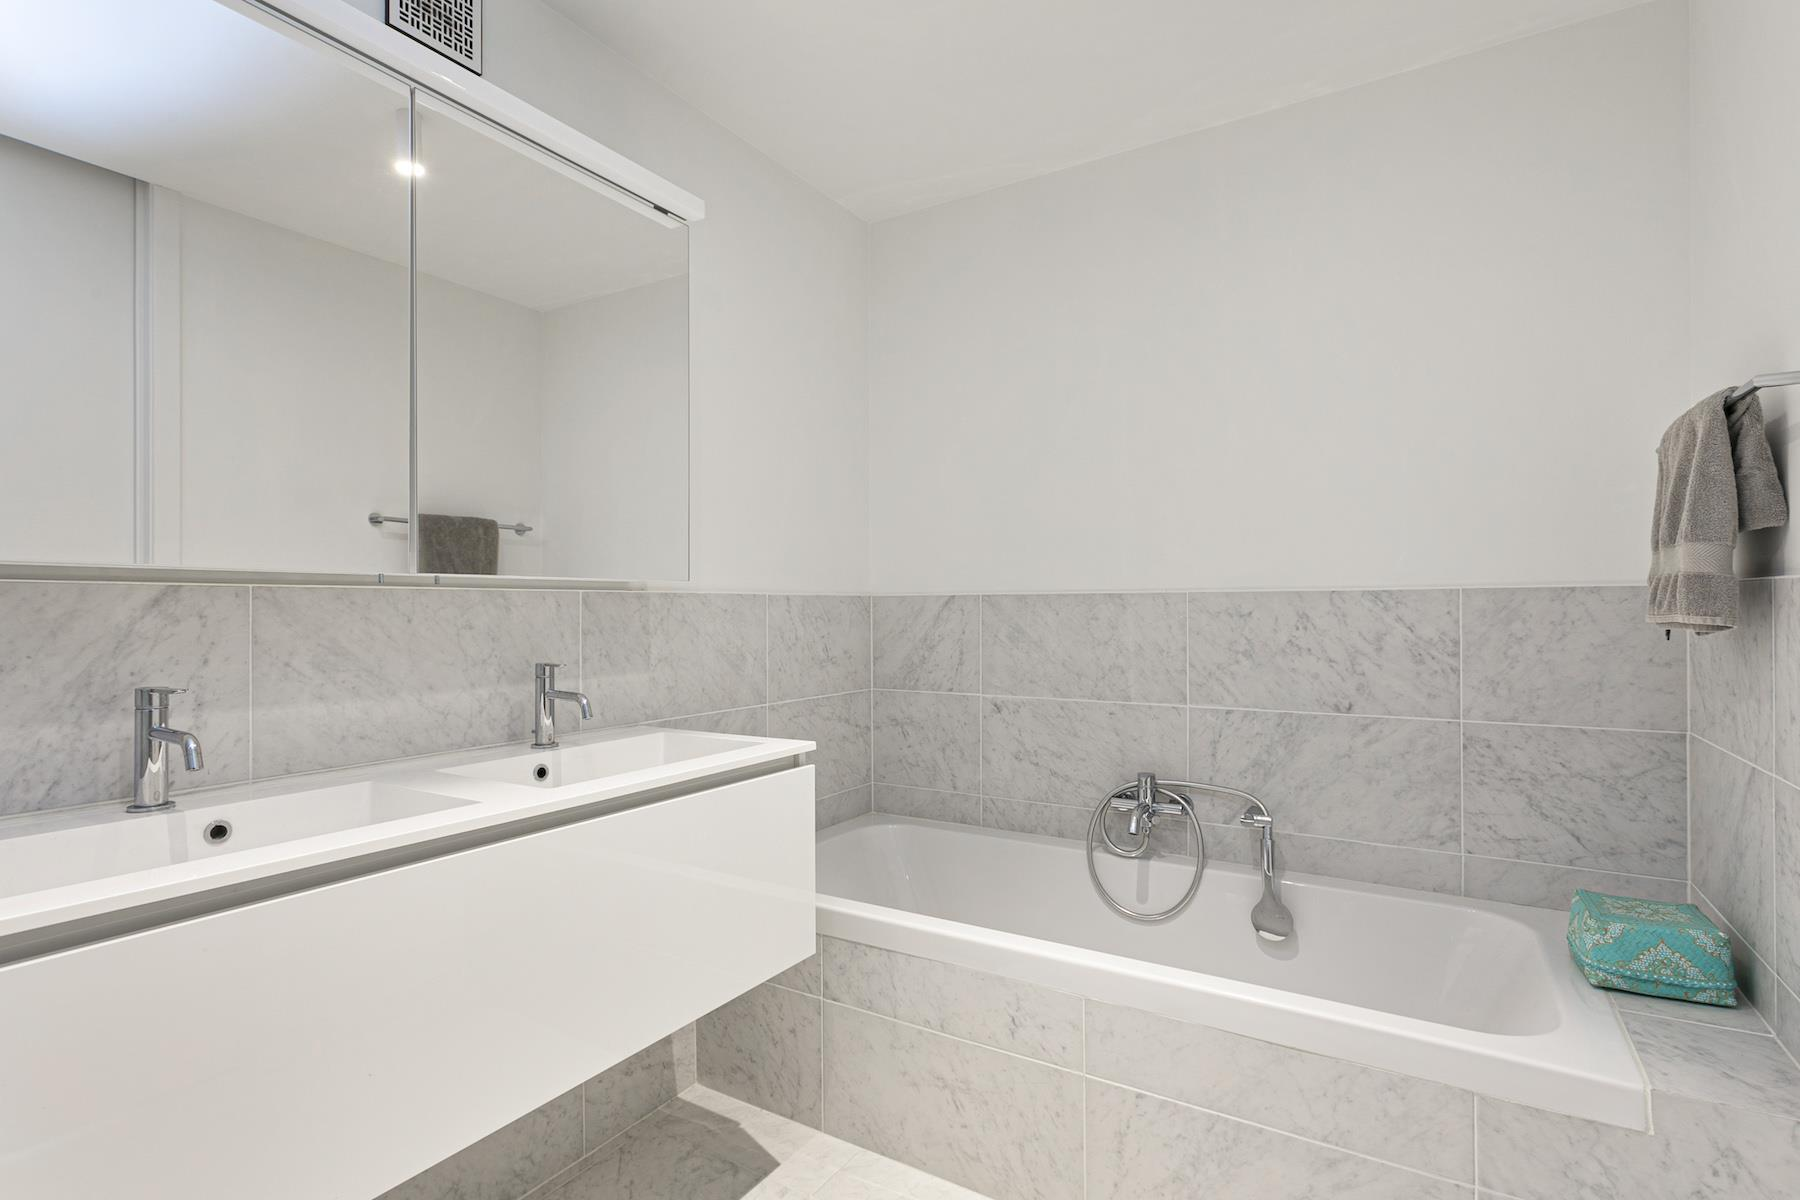 ka-a-2358-appartement-te 16